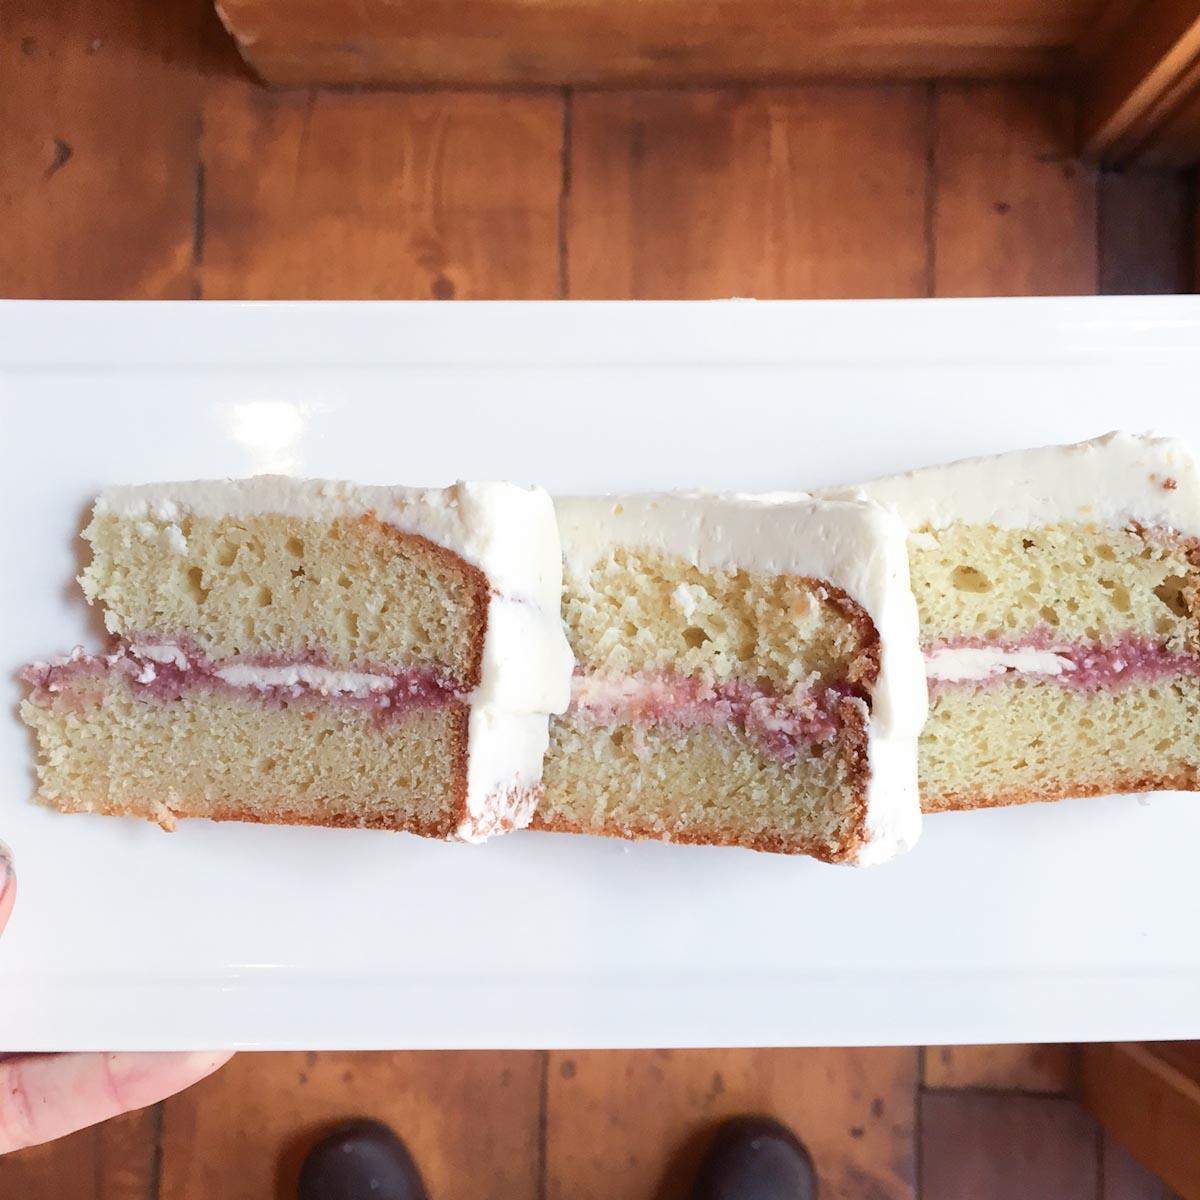 Culinary School Blog • theVintageMixer.com #culinaryschool